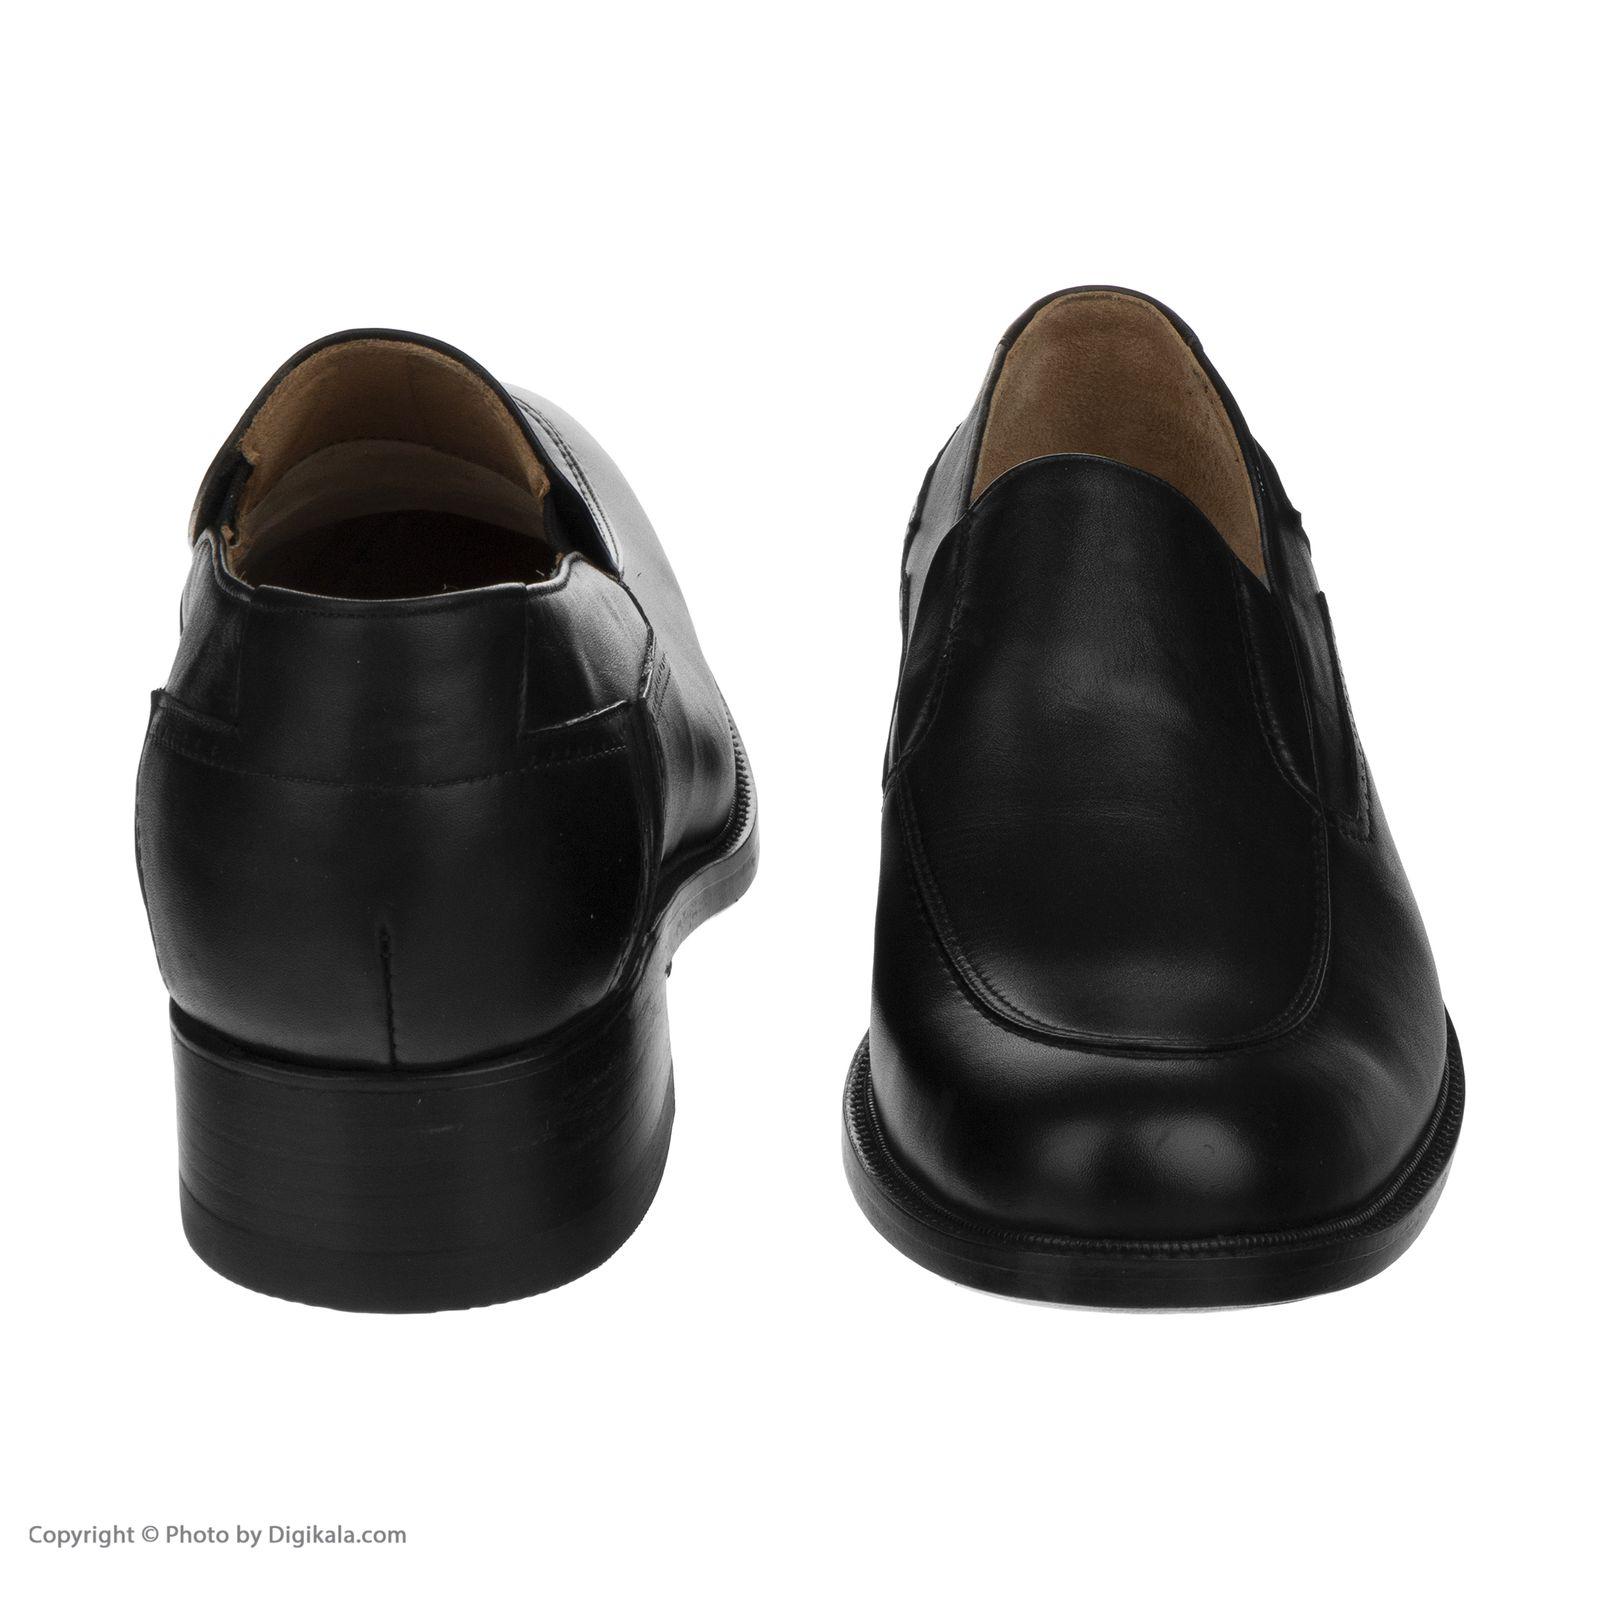 کفش مردانه نظری کد 426 -  - 2